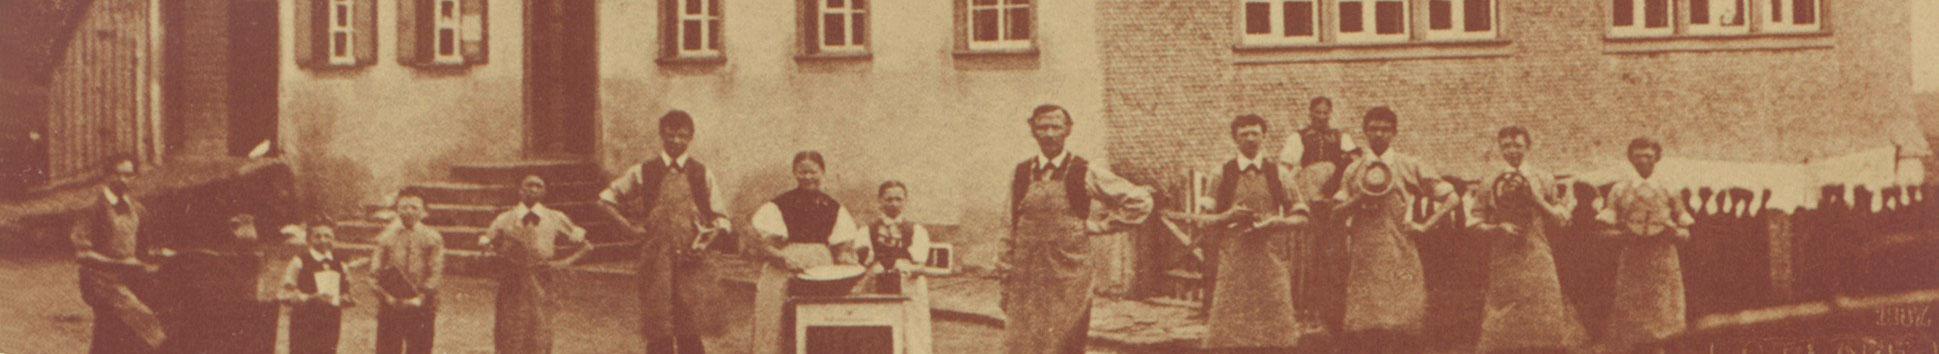 Haus Historie 1887